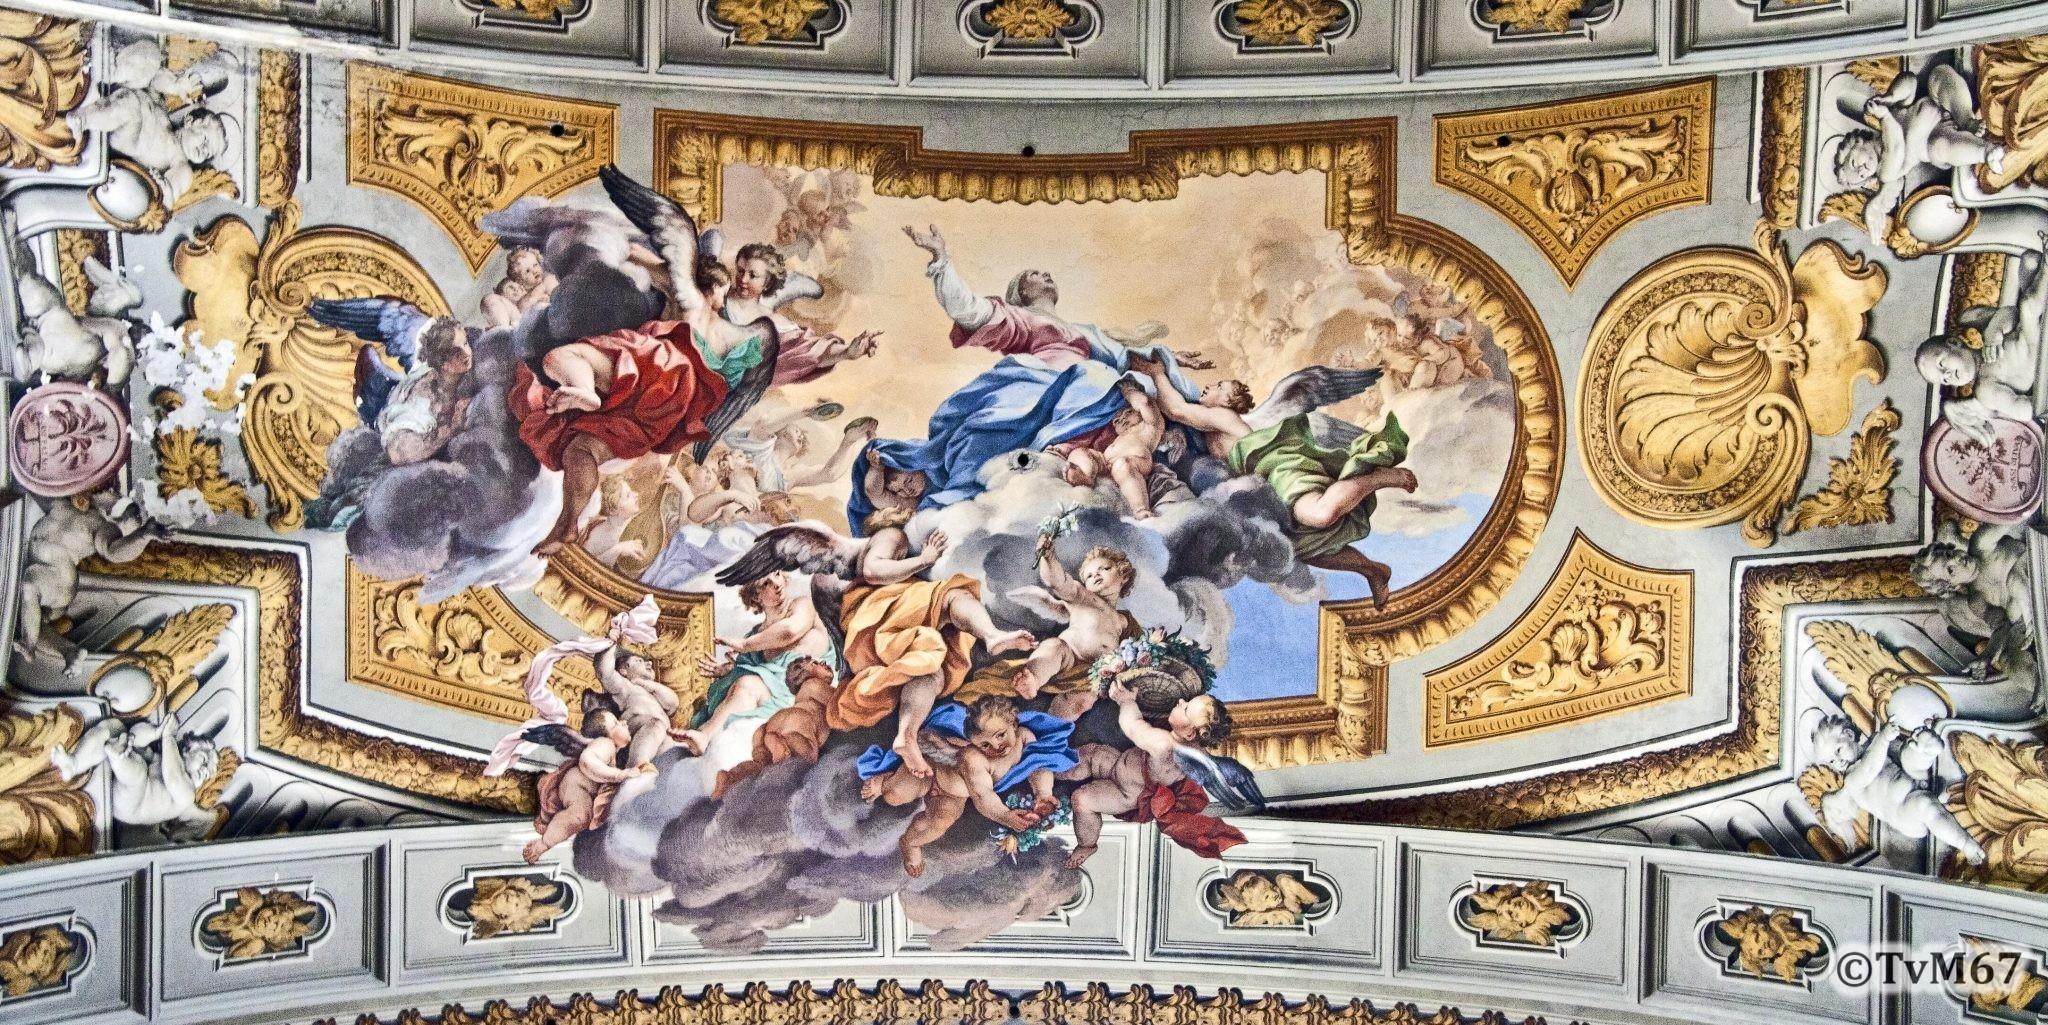 Roma, Chiesa di Sant'Ignazio, trans li, gewelfboog, Pozzo, Maria Hemelvaart, 2011